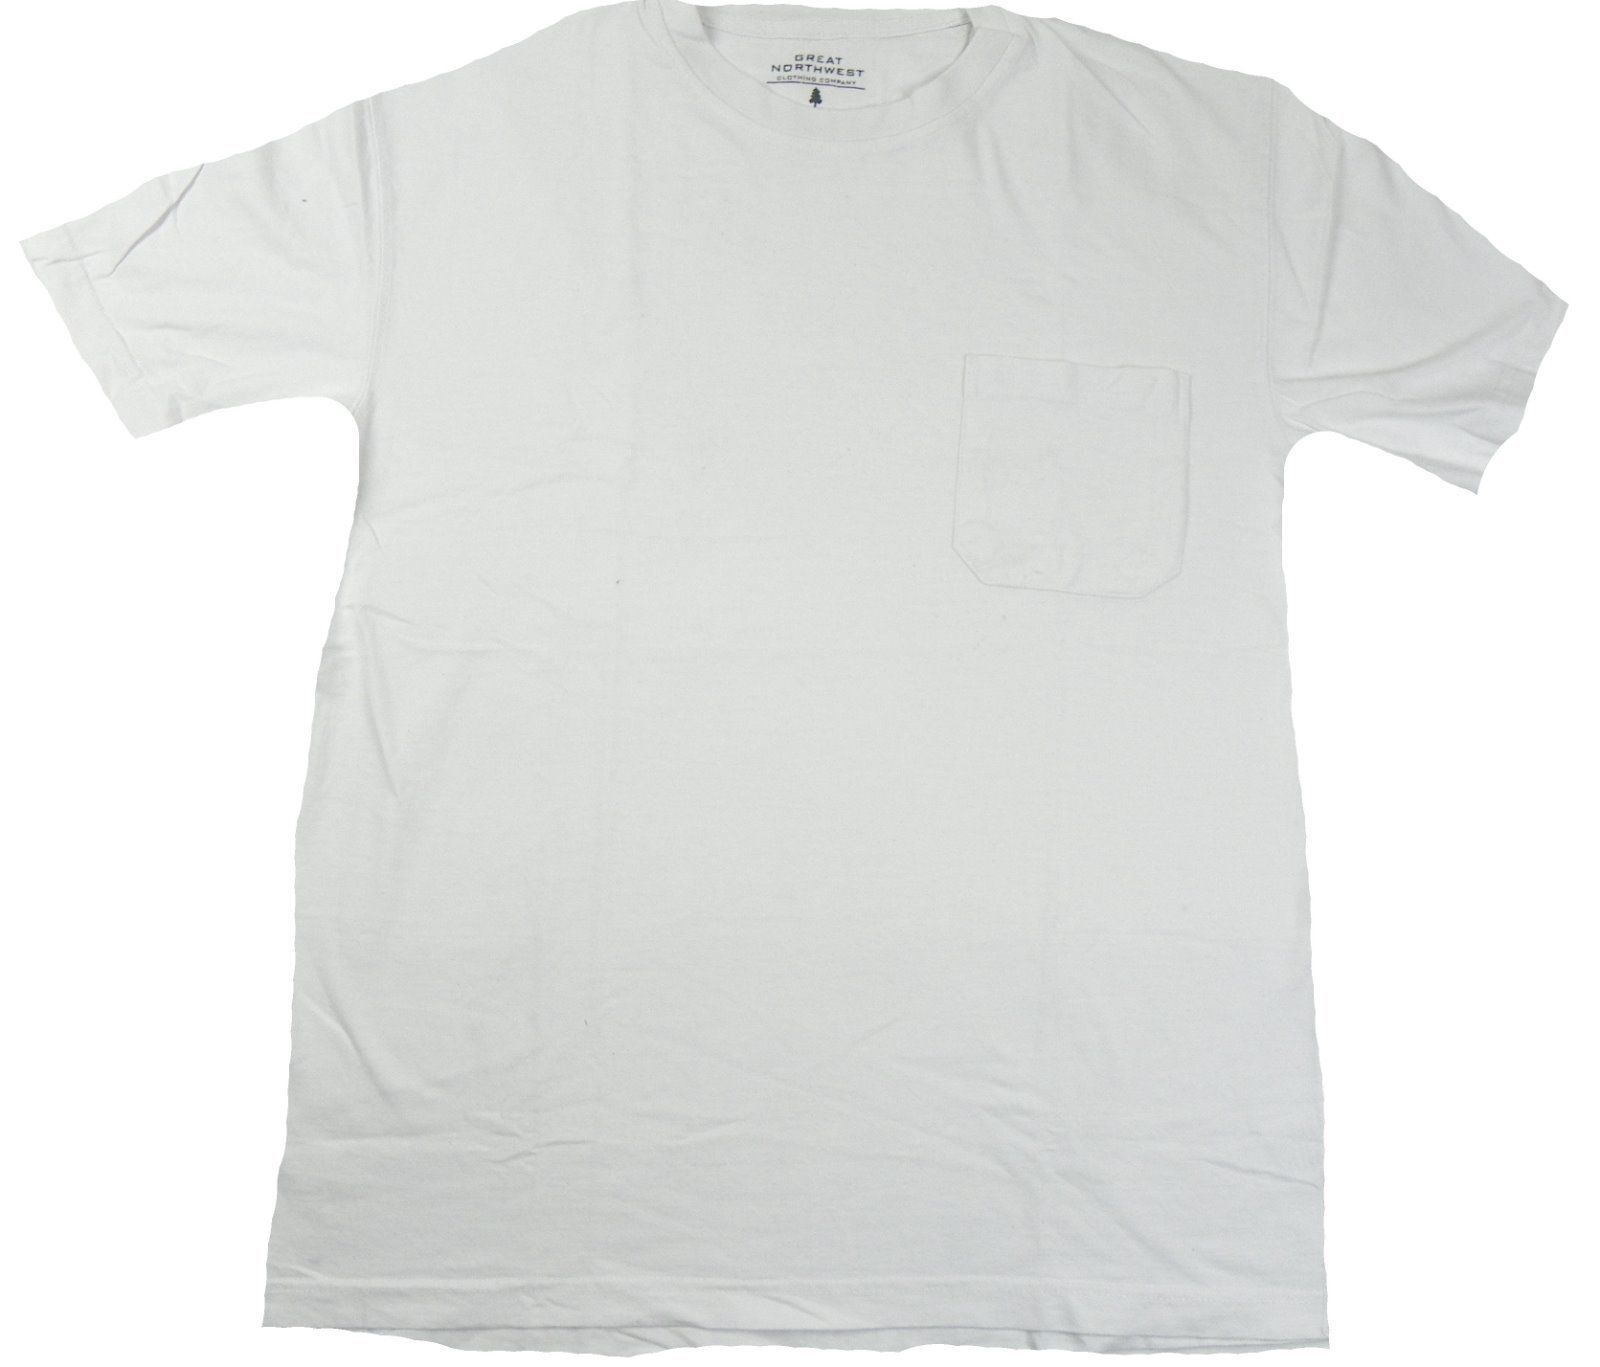 Men's Pocket Tee Great Northwest Clothing Company Shirt